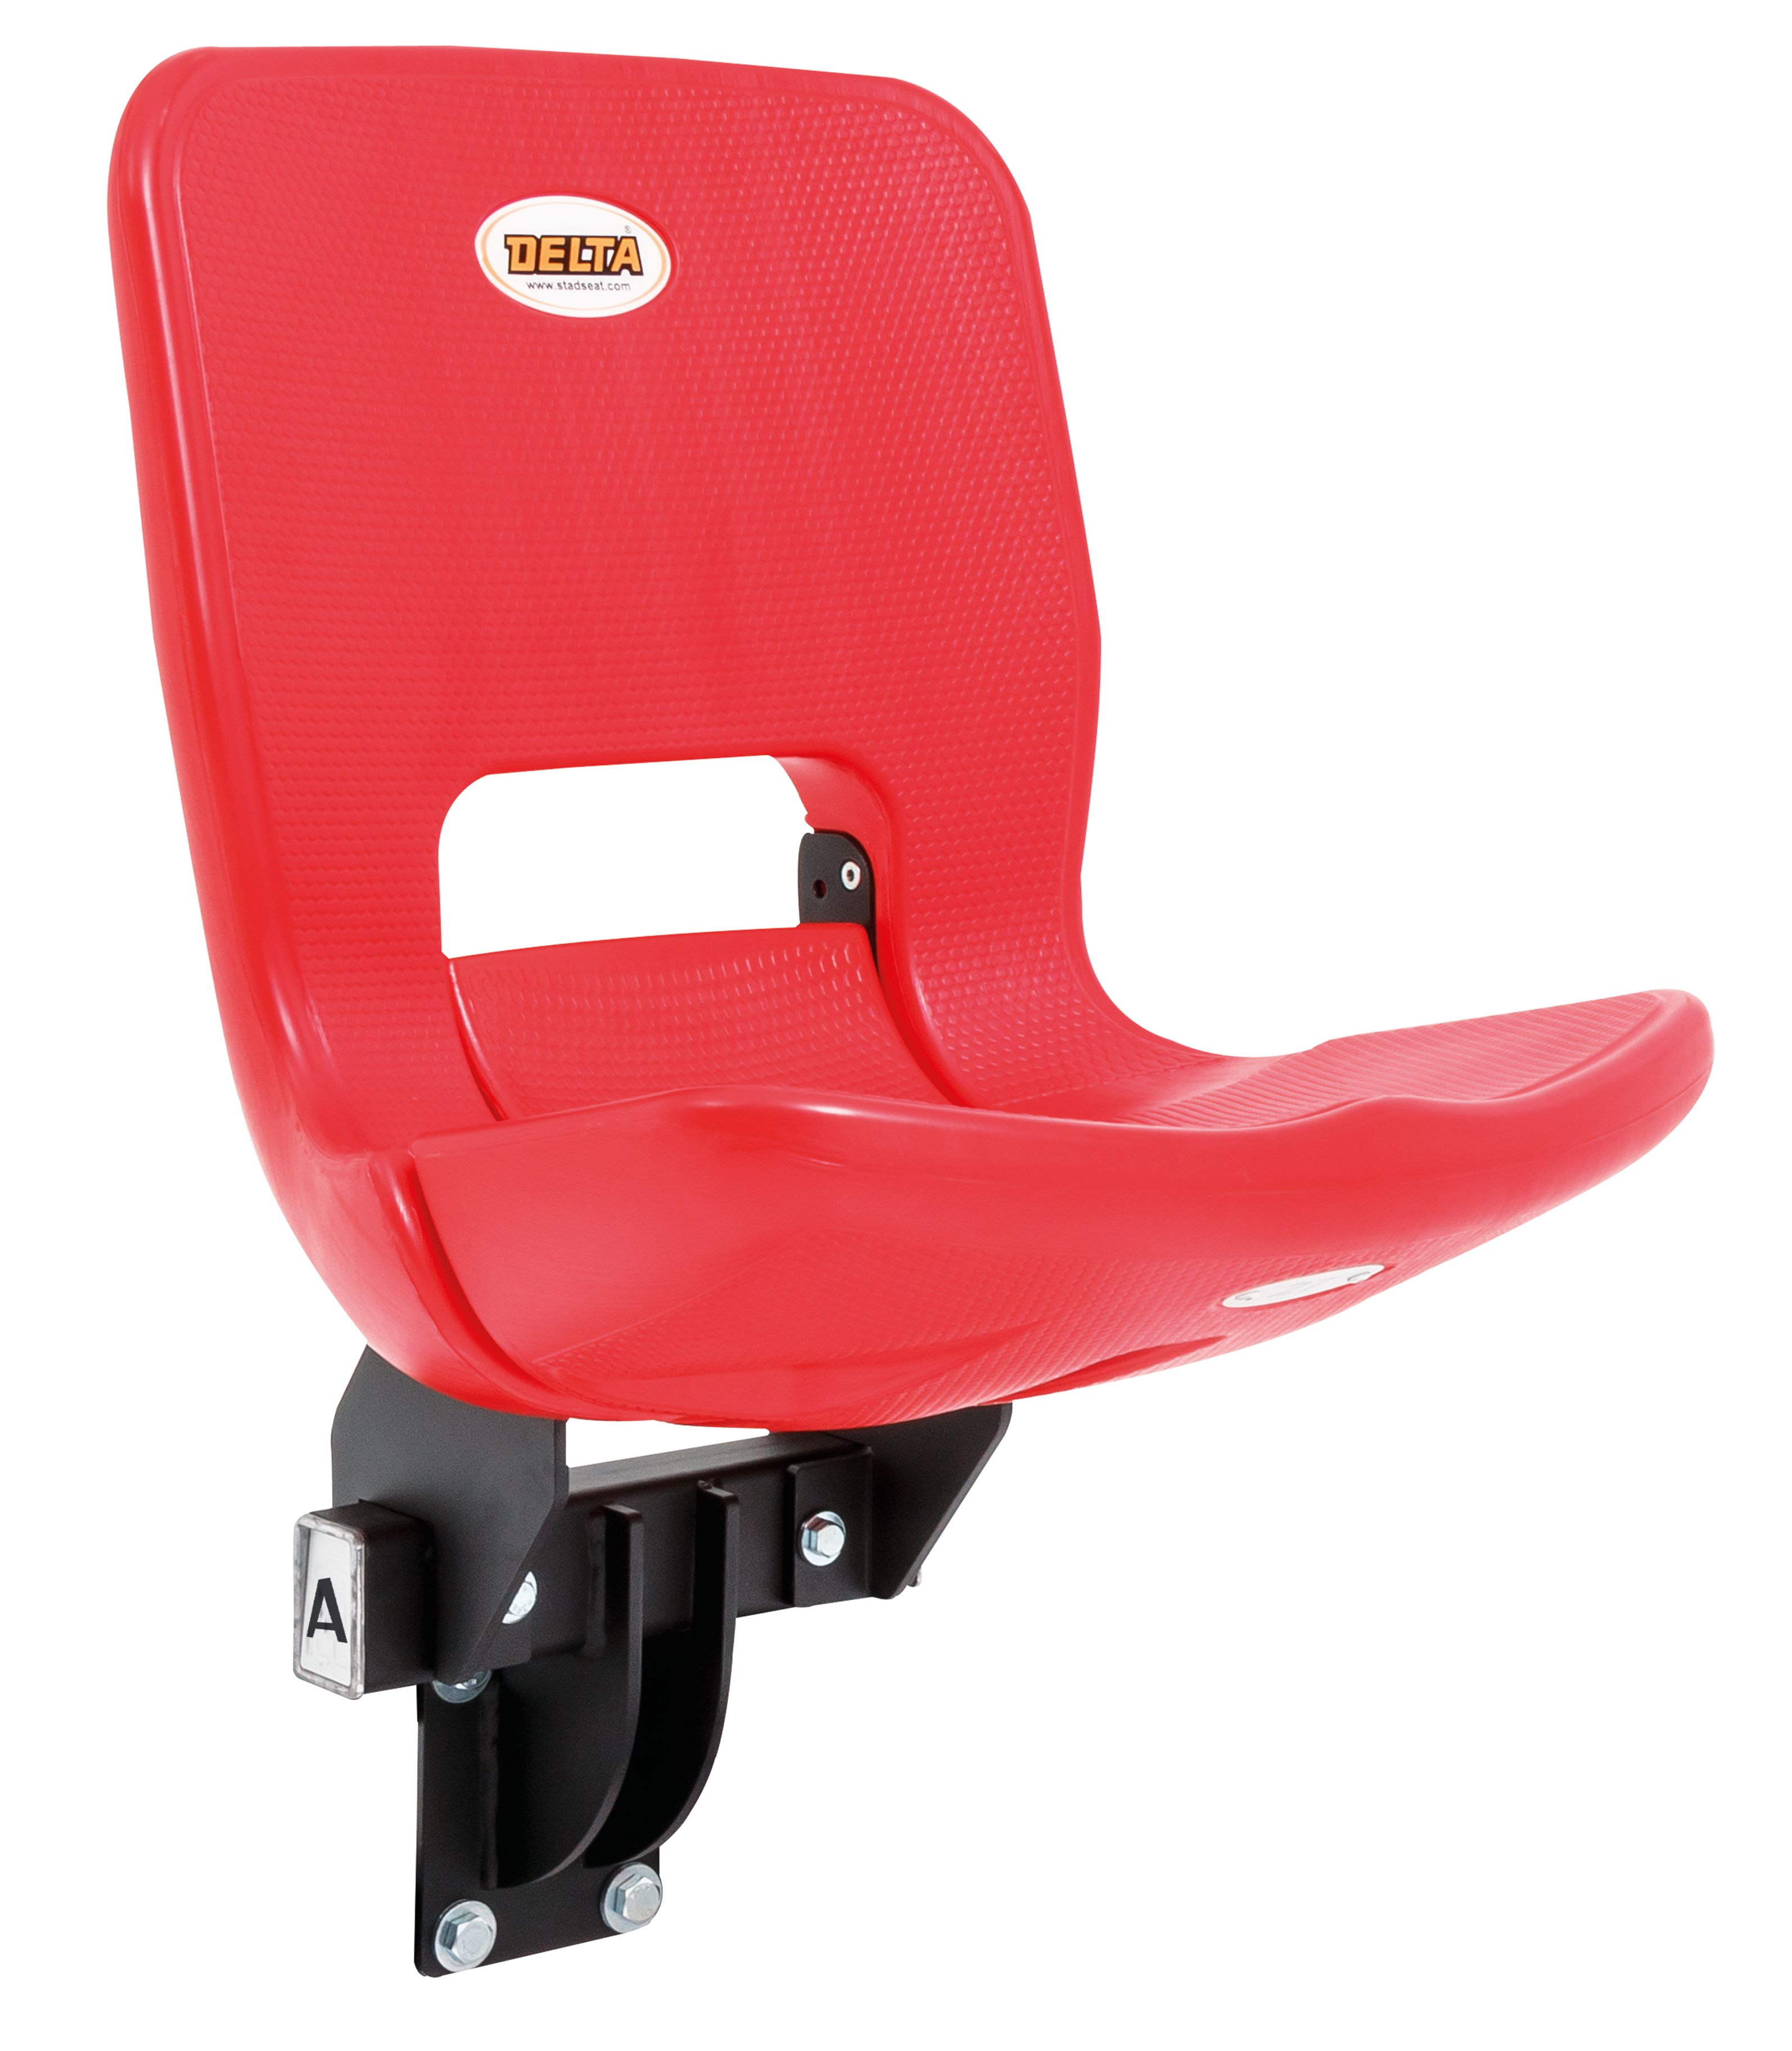 linea_backrest_monoblock_copolymer_pp_stadium_chair_seatorium_23